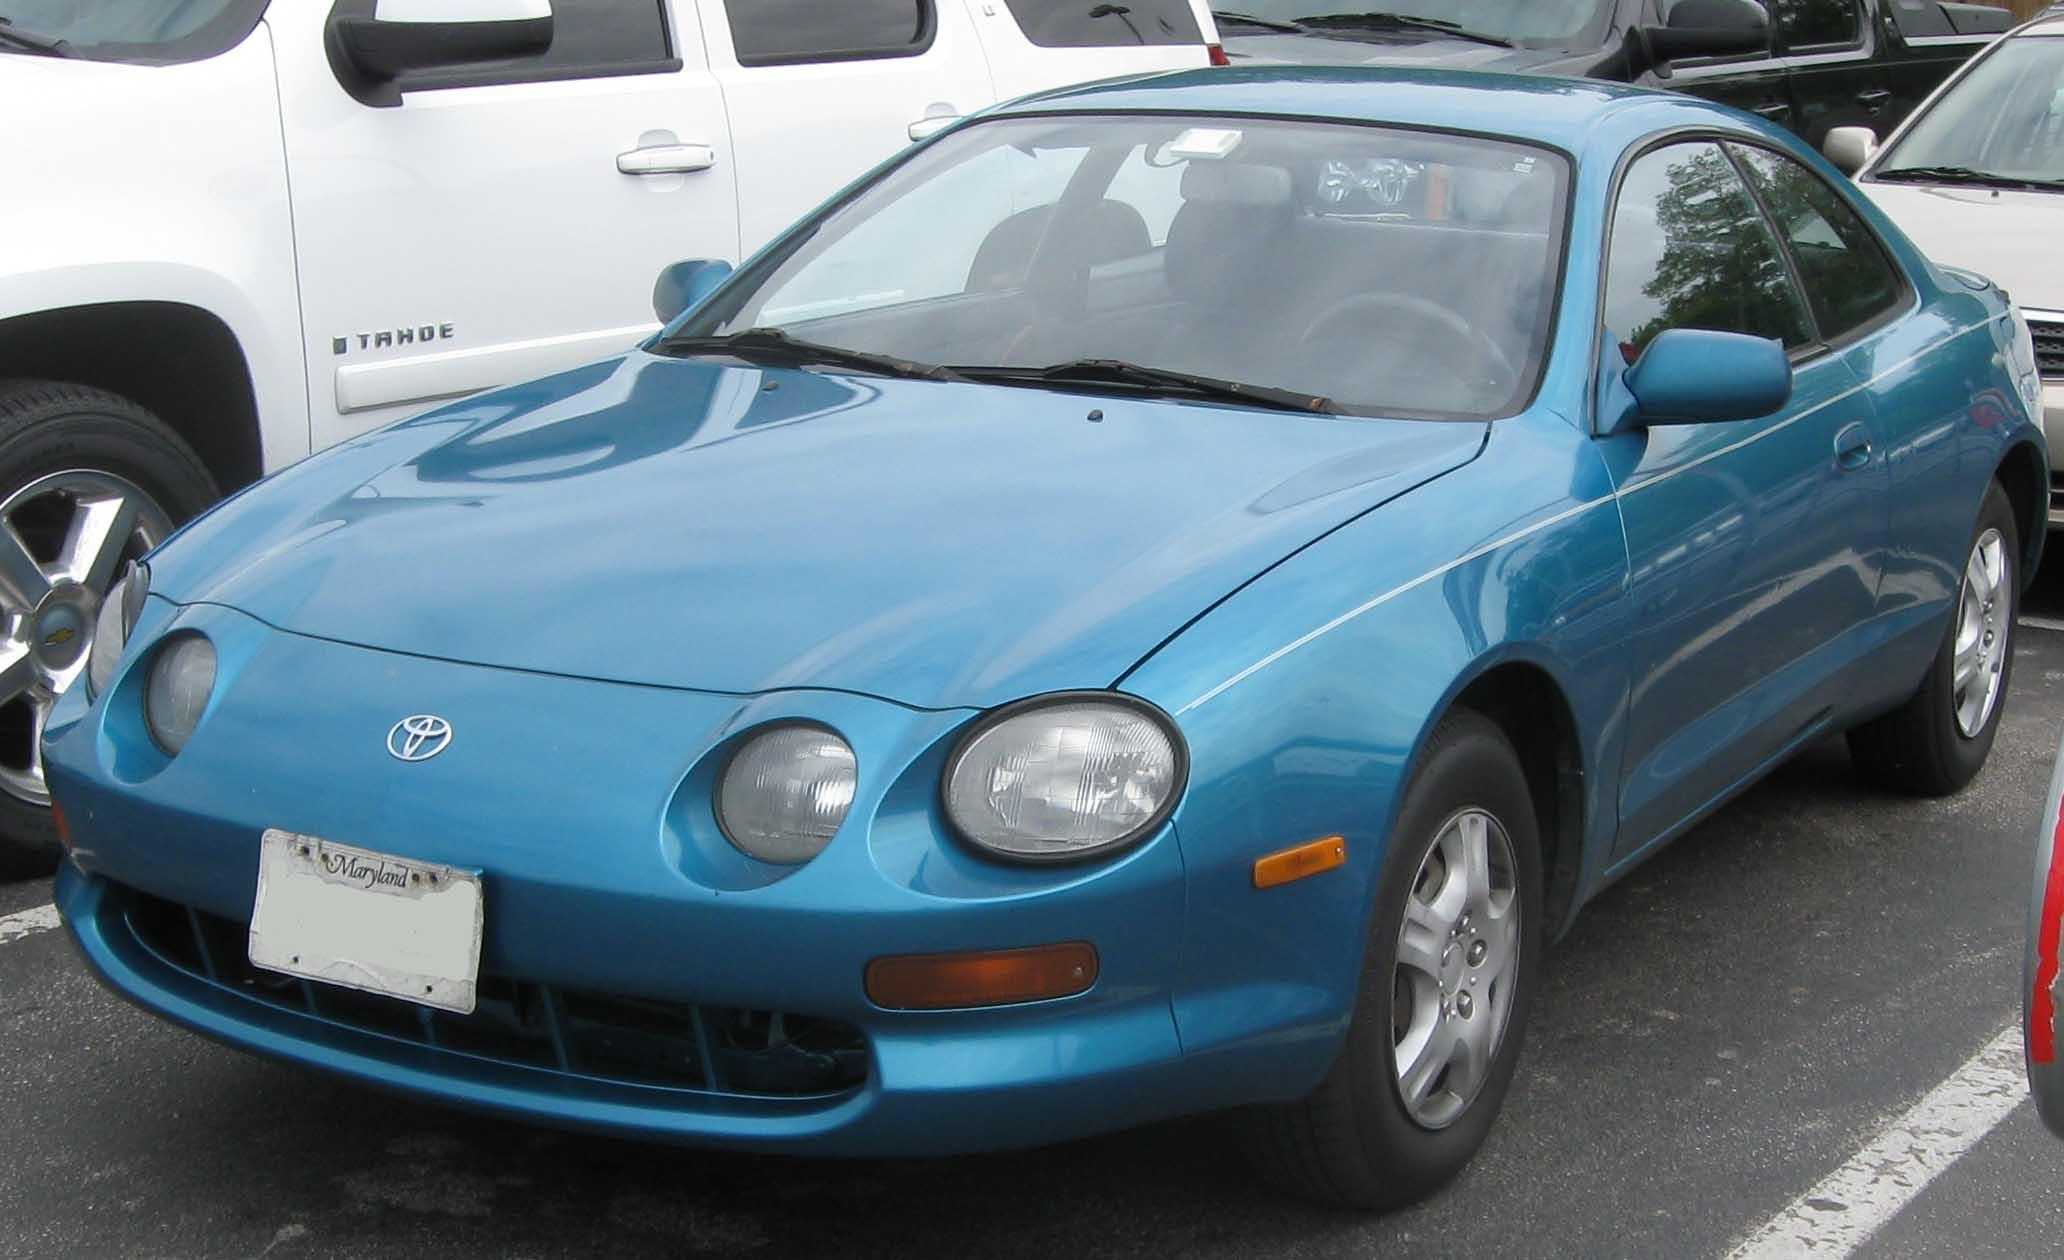 File:Toyota Celica coupe.jpg - Wikimedia Commons